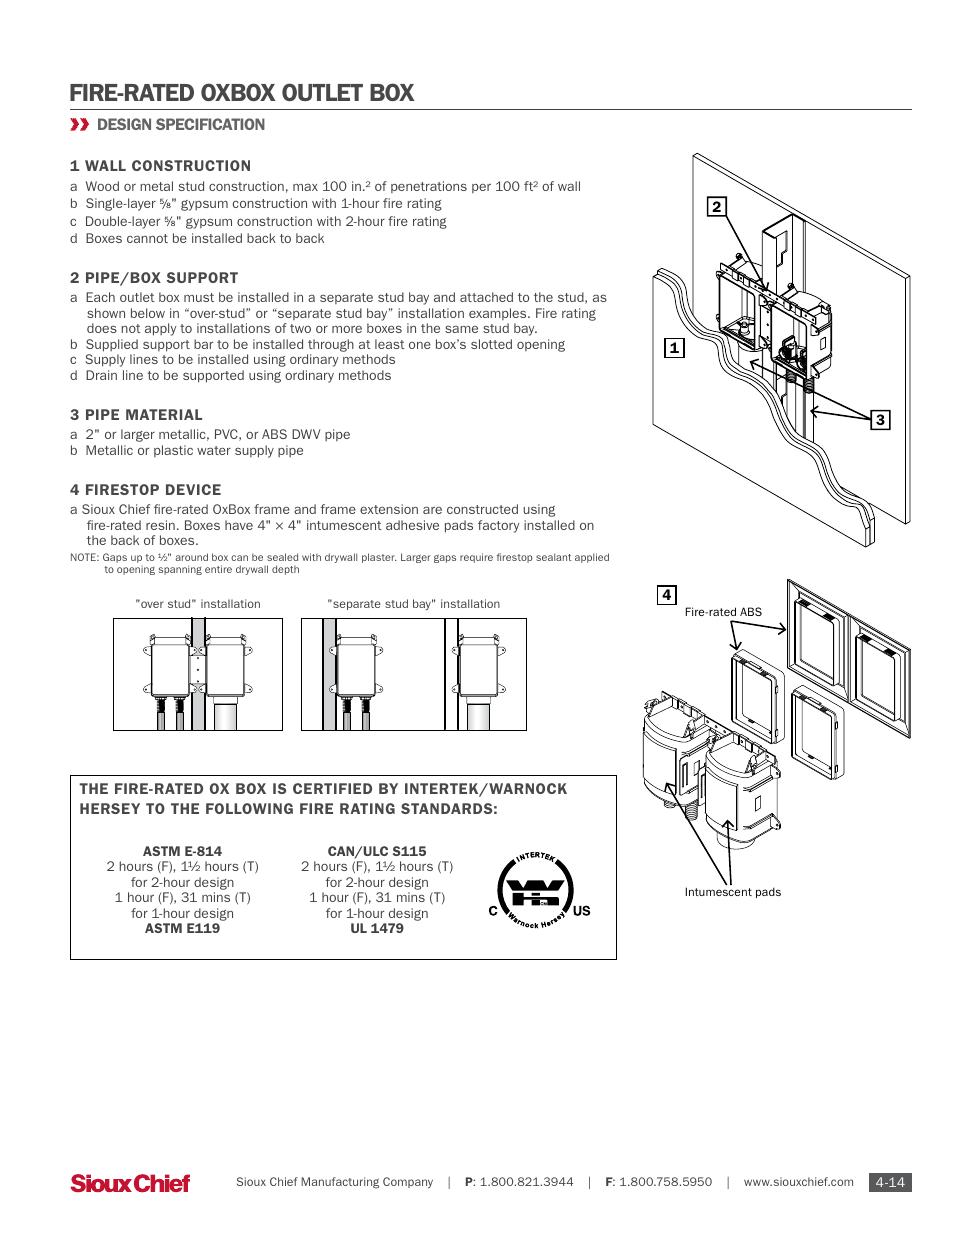 Ocular penetration restriction act